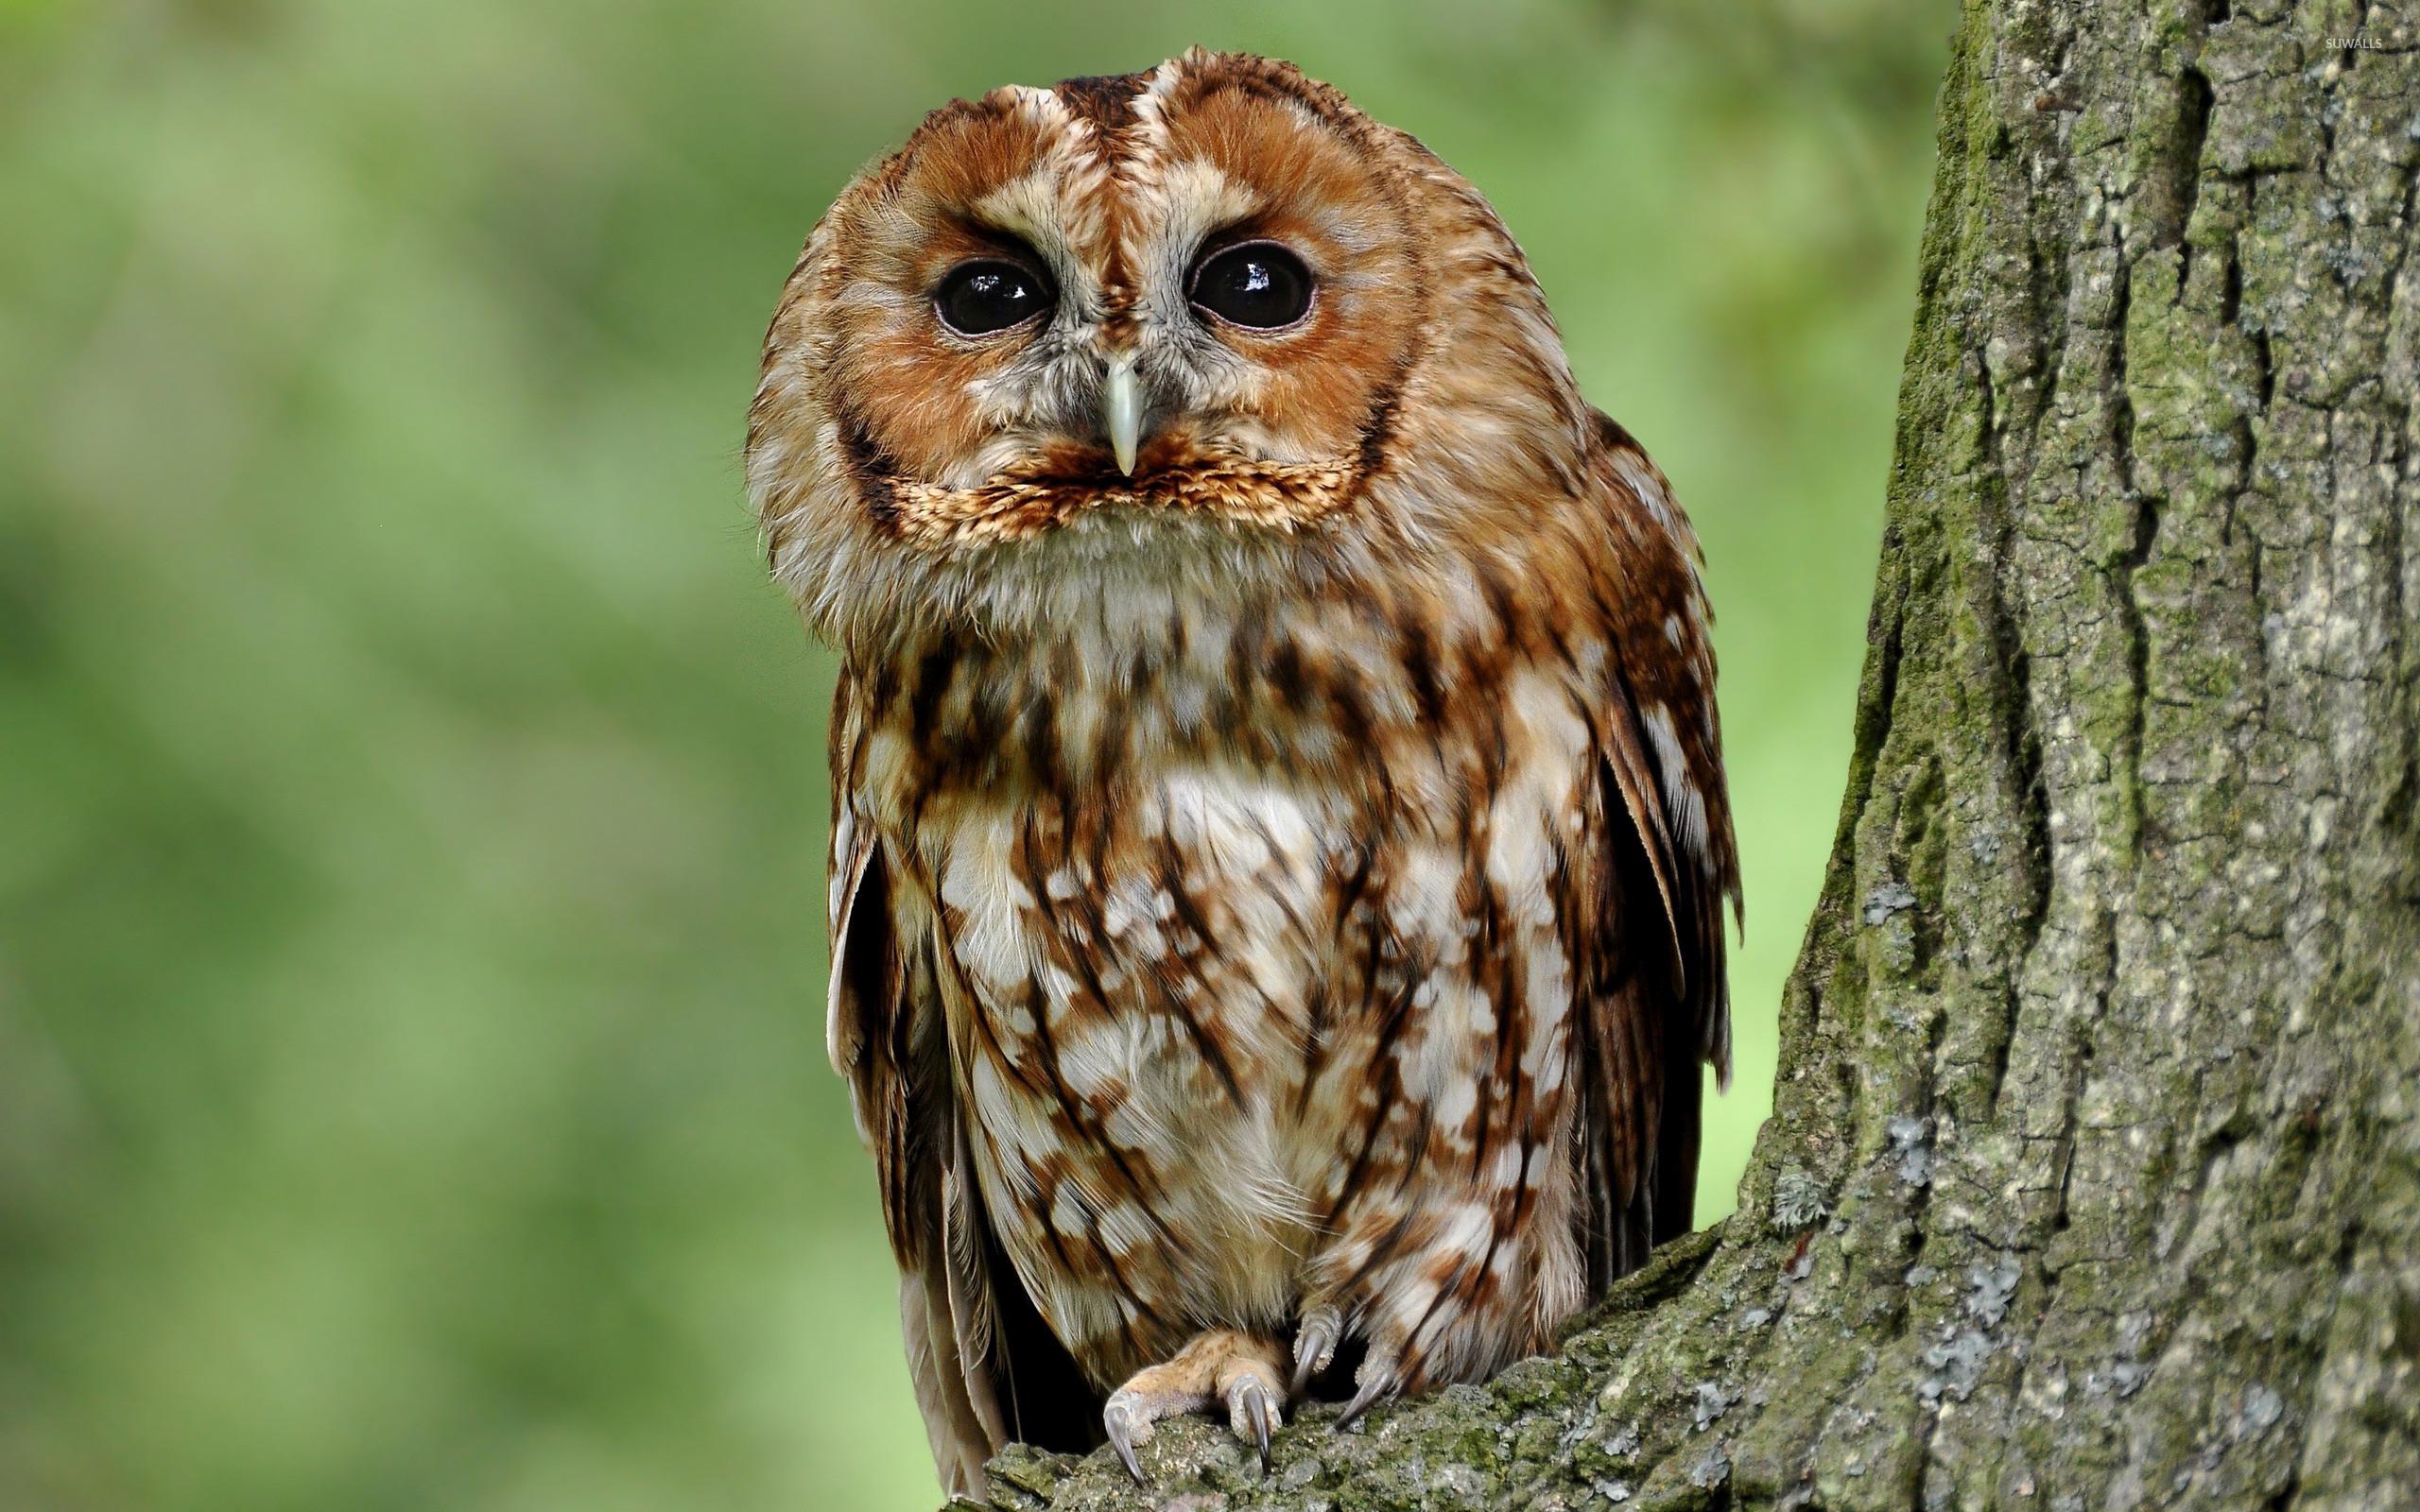 Tawny owl in a tree wallpaper jpg